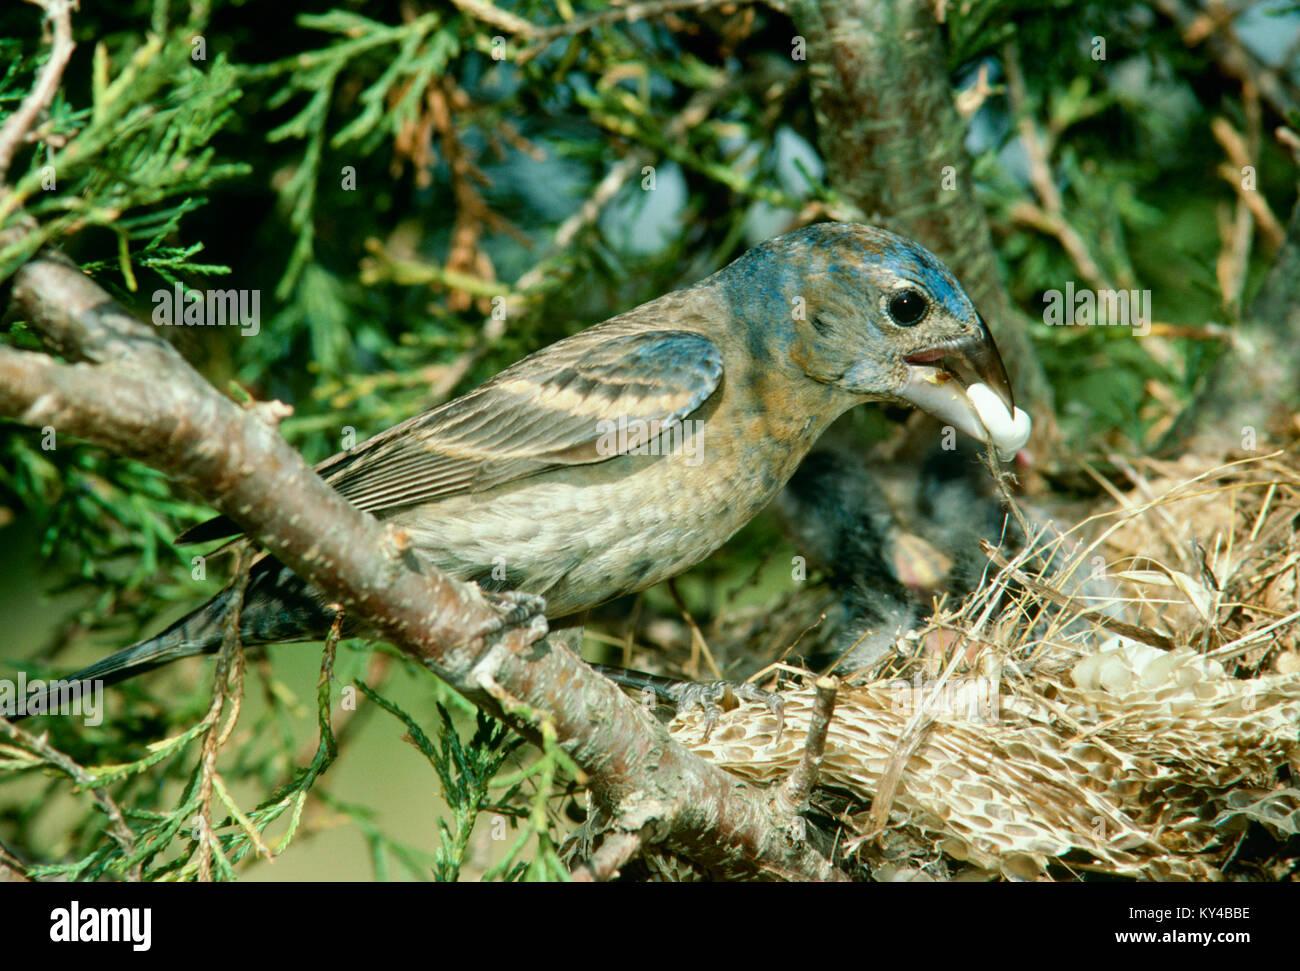 Female Blue Grosbeak mother, Passerina caerulea, takes fecal sac from nestlings in unusual  nest -- straw and snakeskin - Stock Image